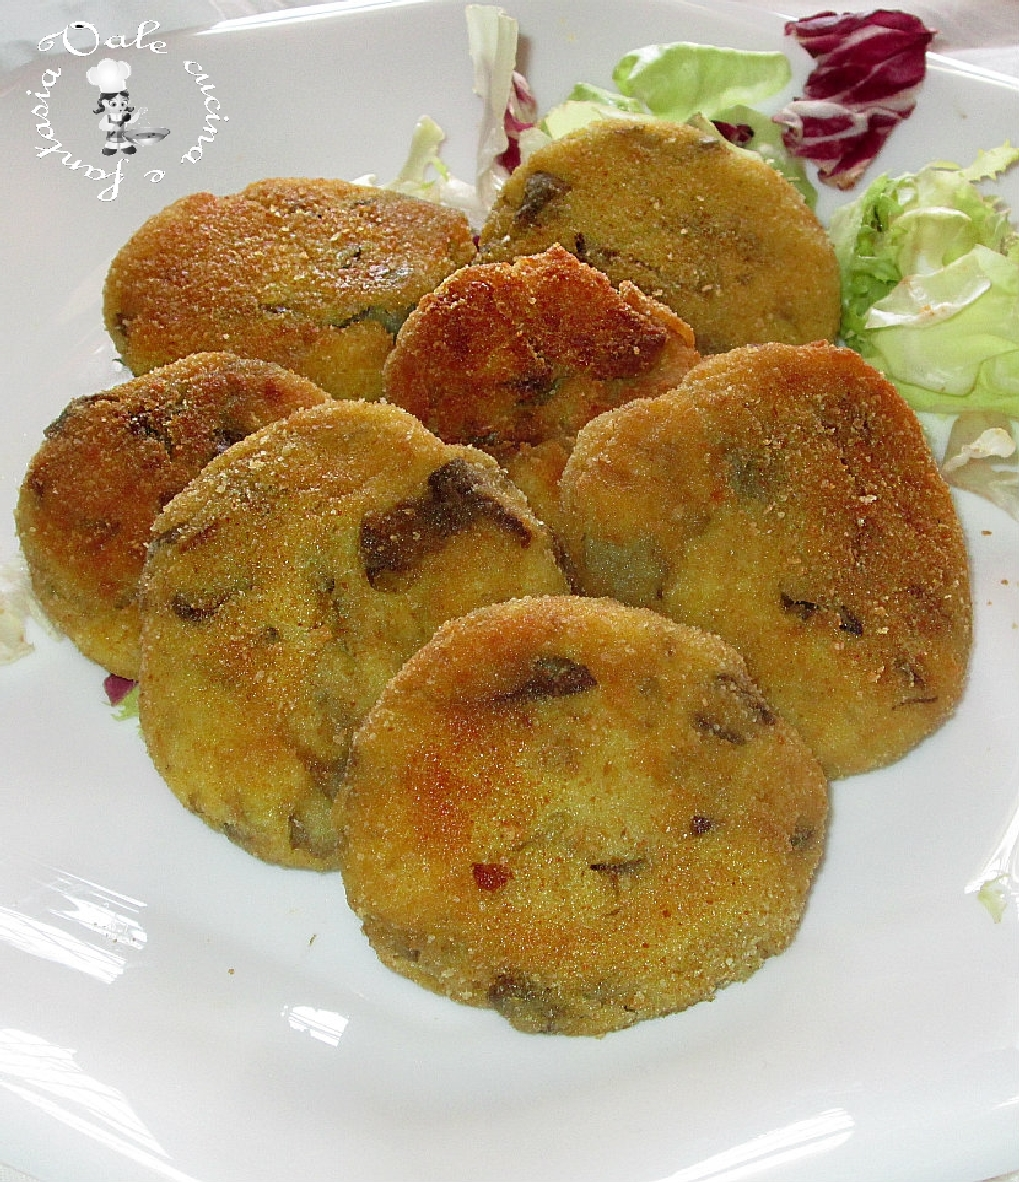 Crocchette di patate e carciofi vale cucina e fantasia - Cucina con vale ...